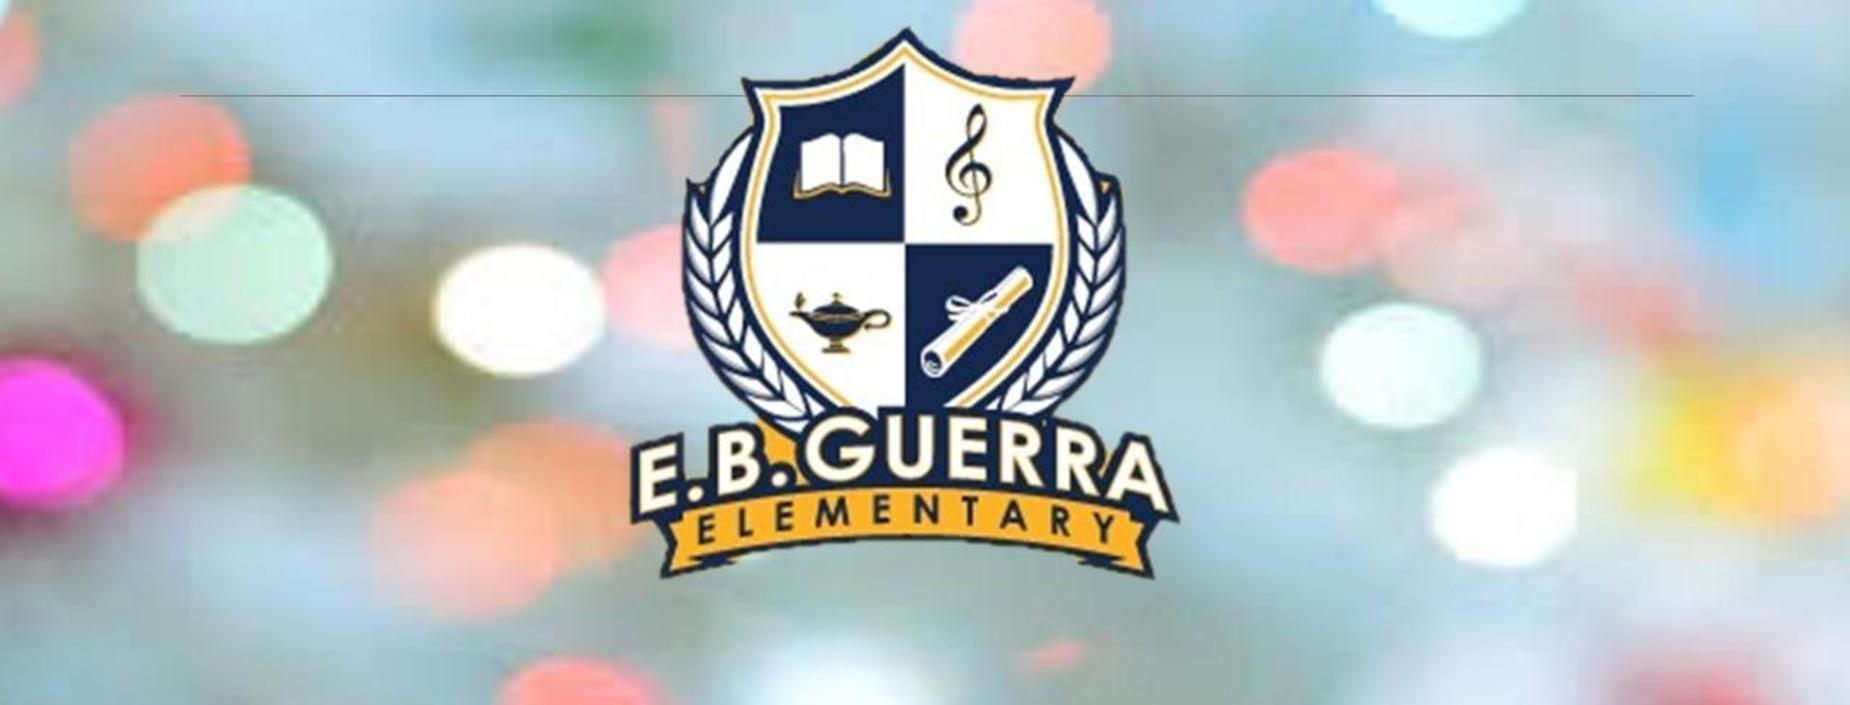 image of Guerra logo